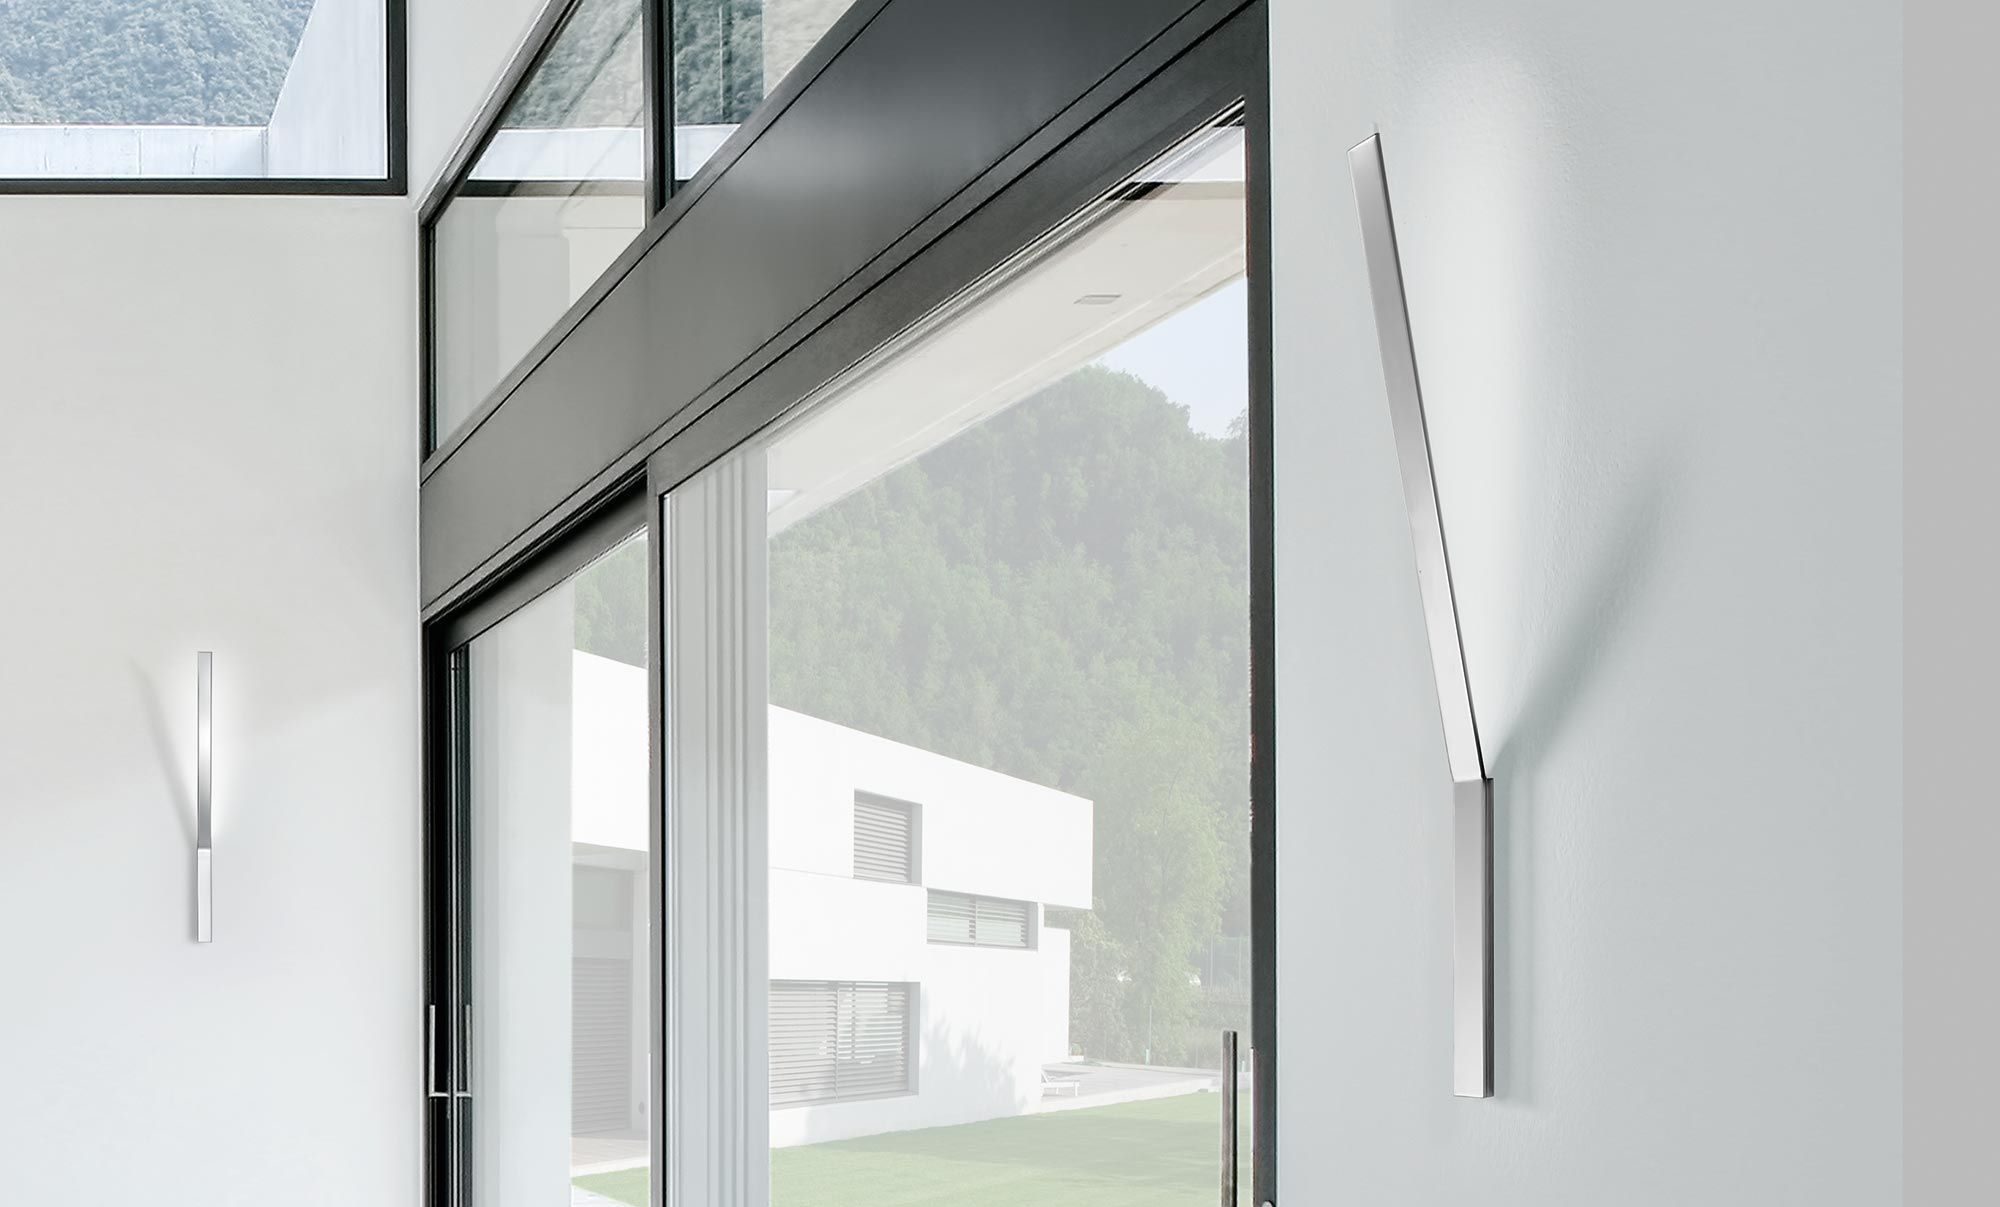 contemporary wall light  metal  glass  polycarbonate  ypsilon  - contemporary wall light  metal  glass  polycarbonate ypsilon panzeri